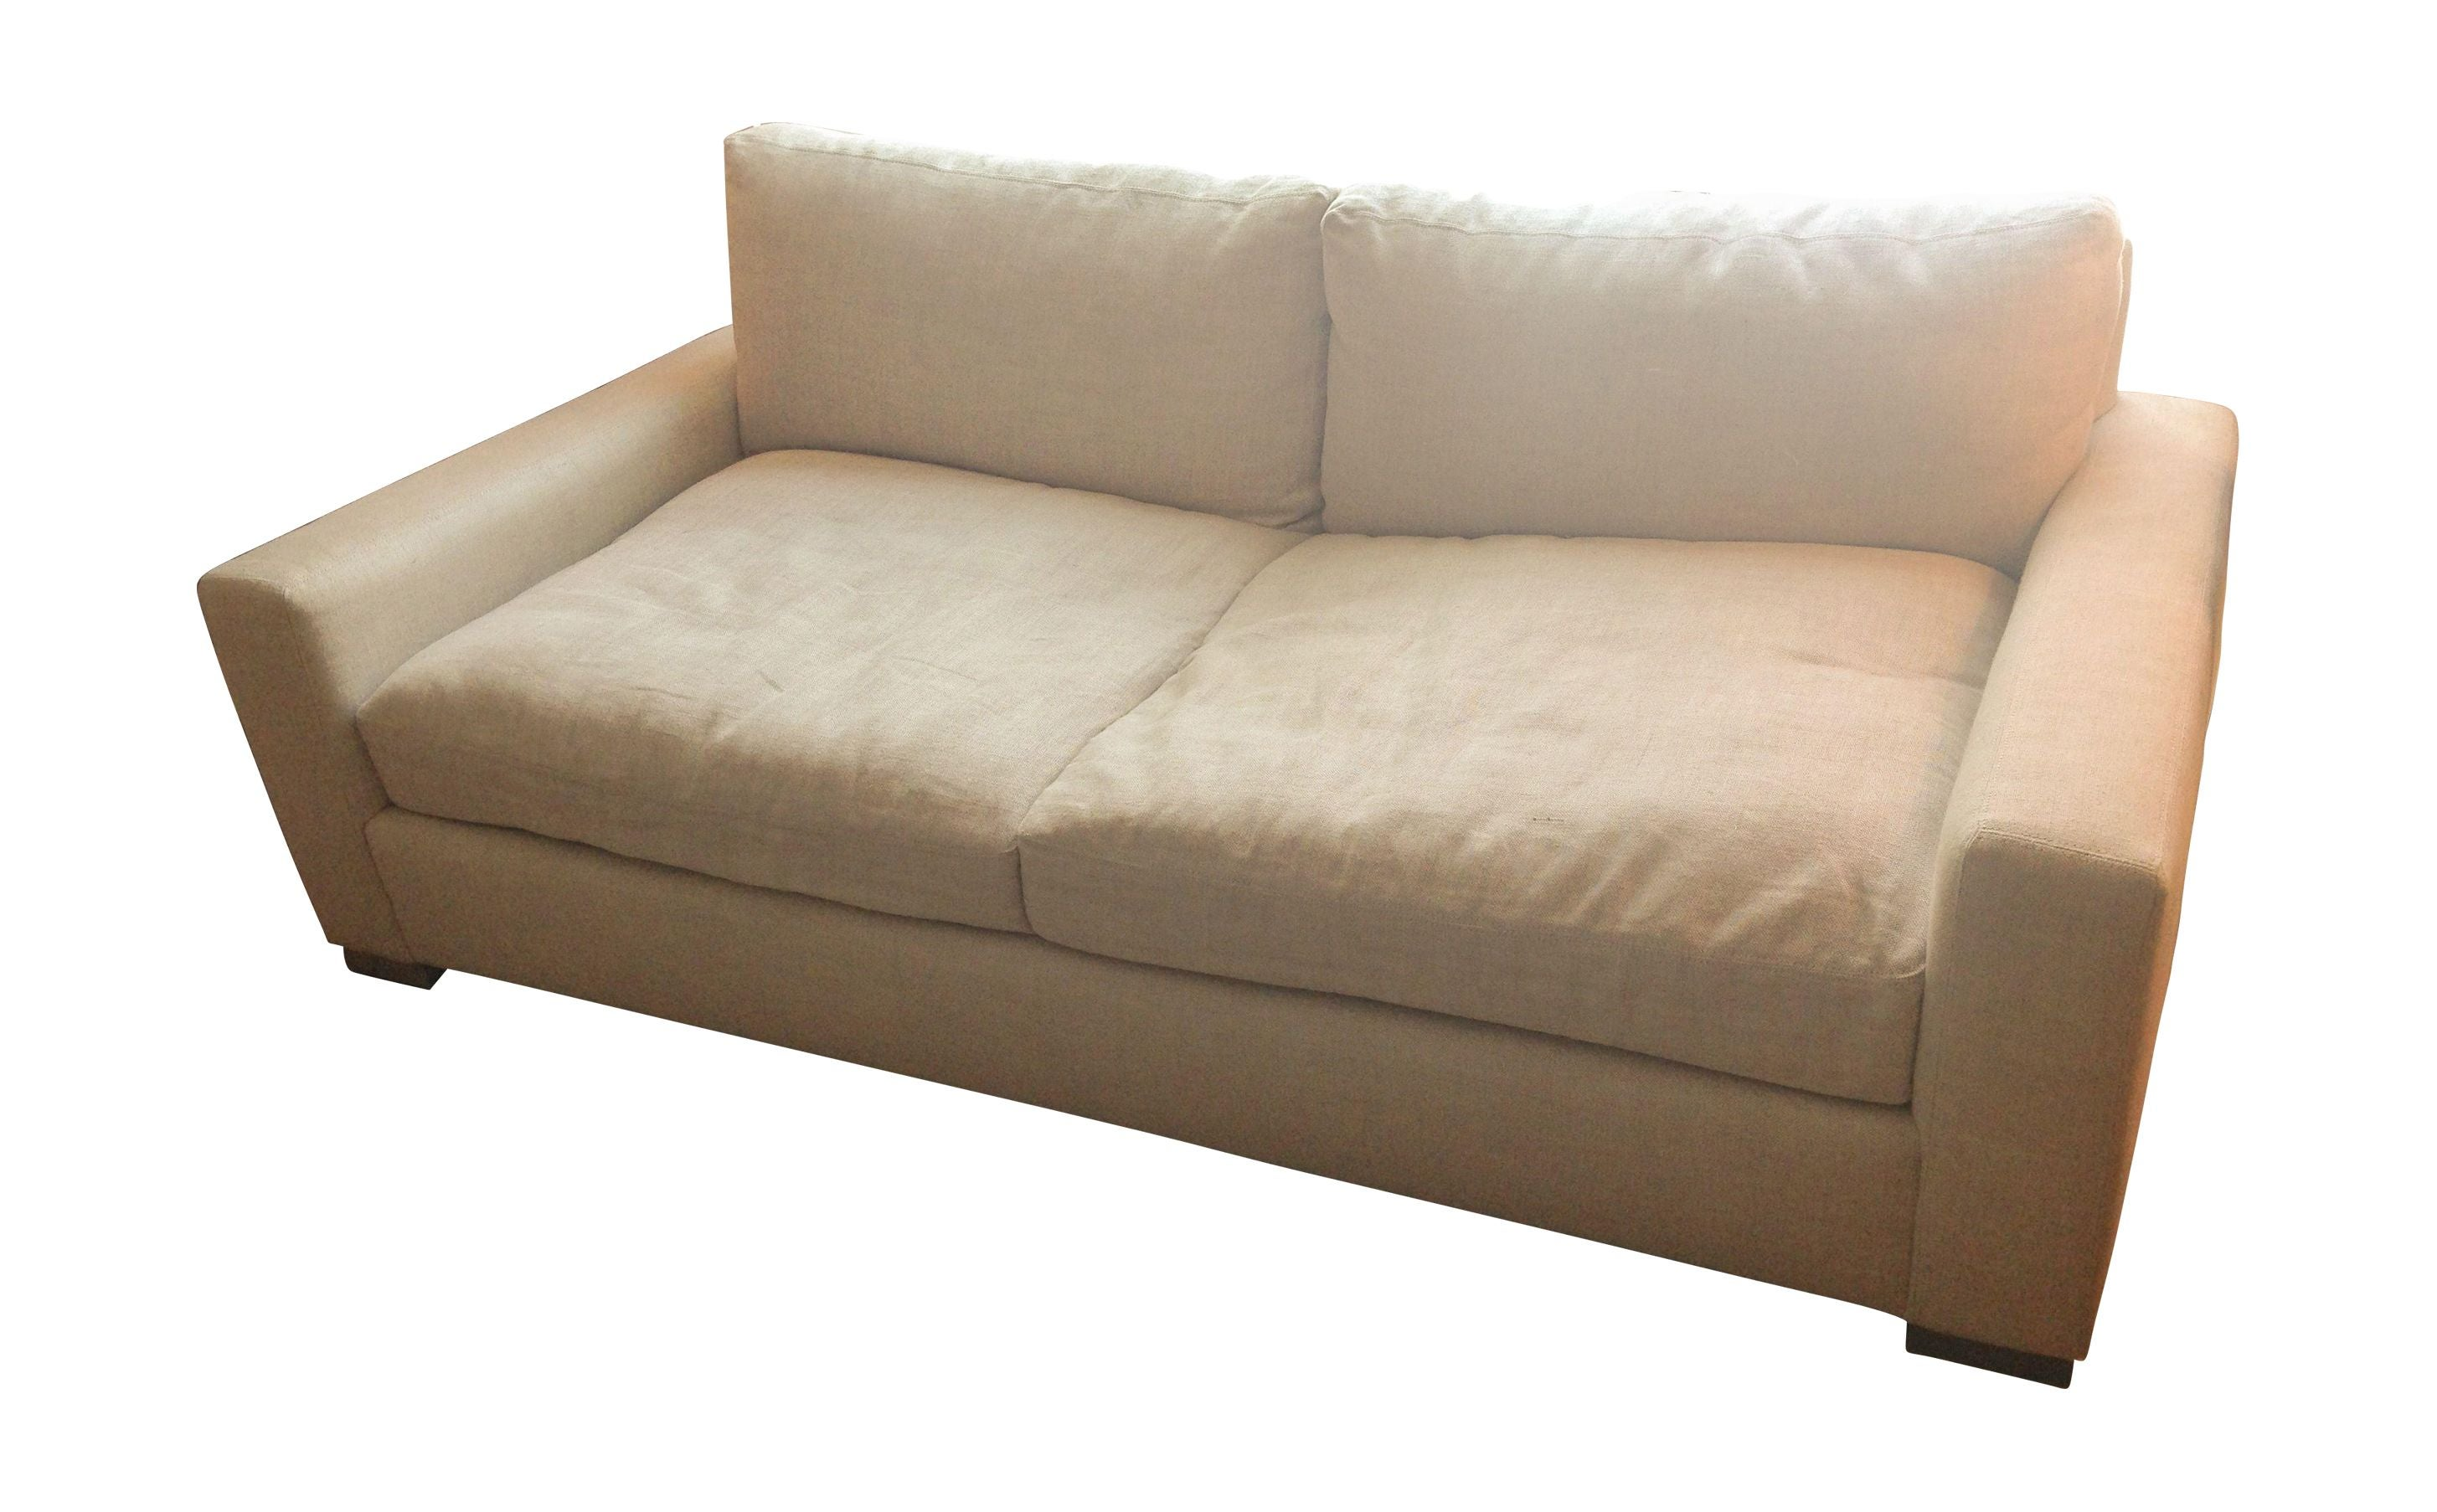 Restoration Hardware Maxwell Upholstered Sofa Chairish : 78d73d39 9b96 4b8c 9379 382d08402c79aspectfitampwidth640ampheight640 from www.chairish.com size 640 x 640 jpeg 19kB